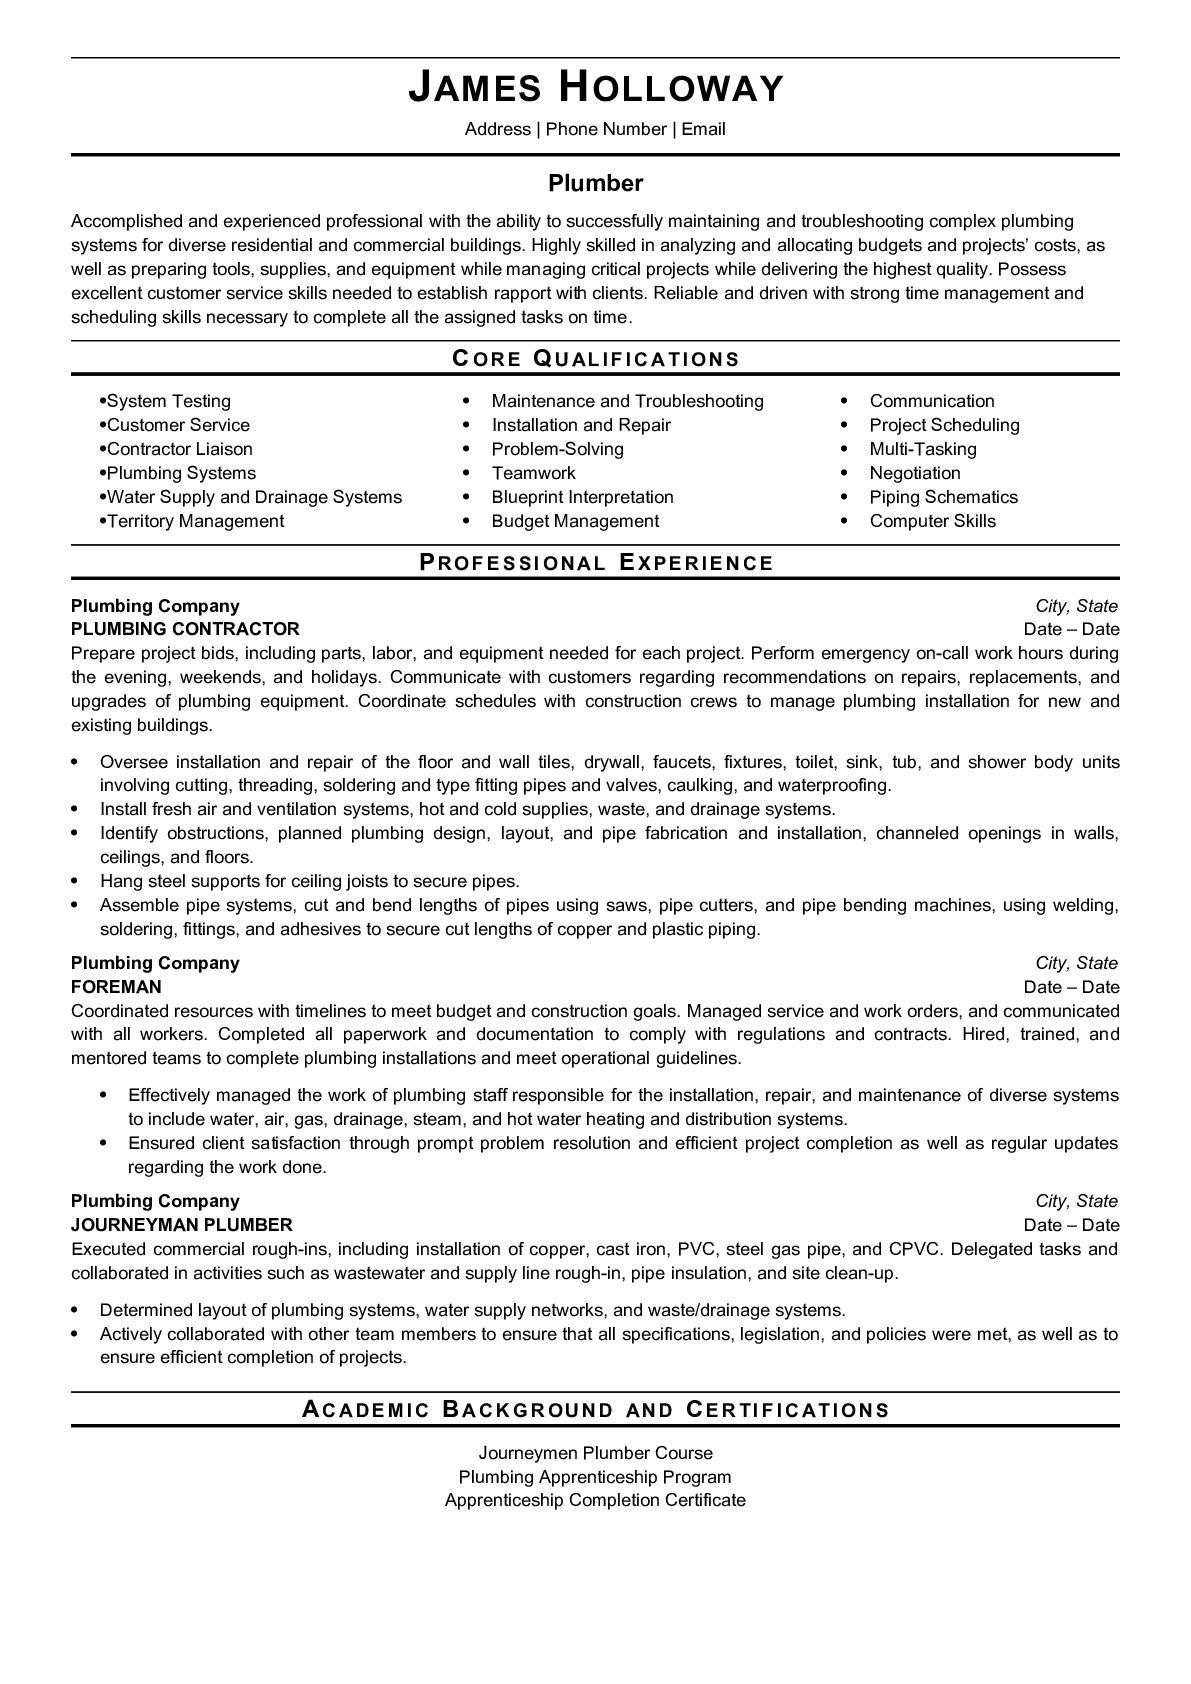 Resume Example for Plumber